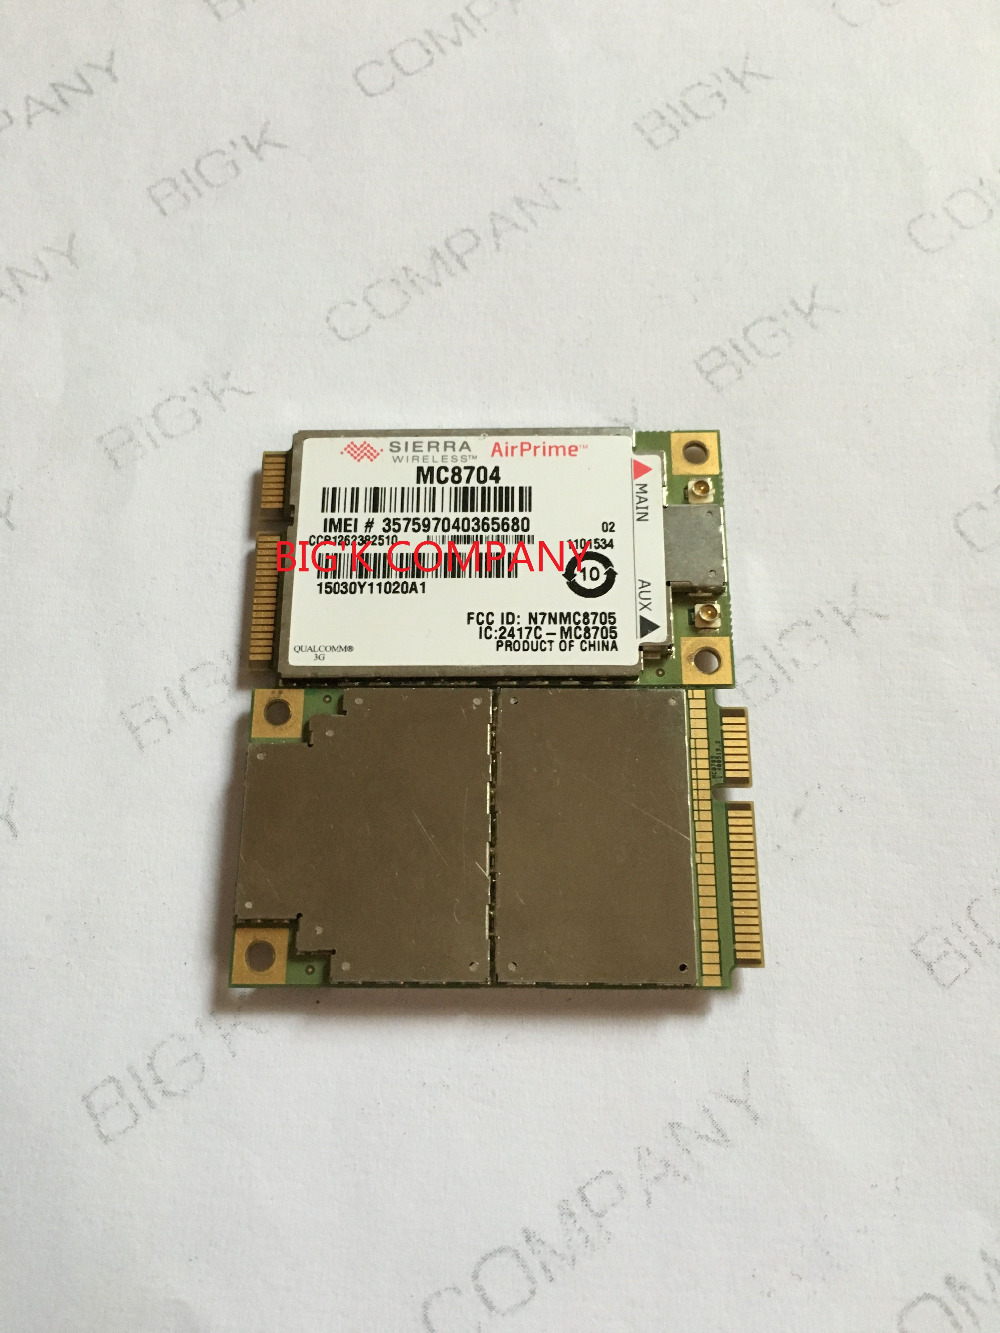 JINYUSHI For WWAN card MC8704 PCI-E HSUPA HSDPA WCDMA 3G module support GPS 100% NEW&Original   stock 1PCS Free Shipping brand new huawei me936 4g ngff m 2 fdd lte wcdma hsdpa hsupa hspa wwan wireless network card pk me906